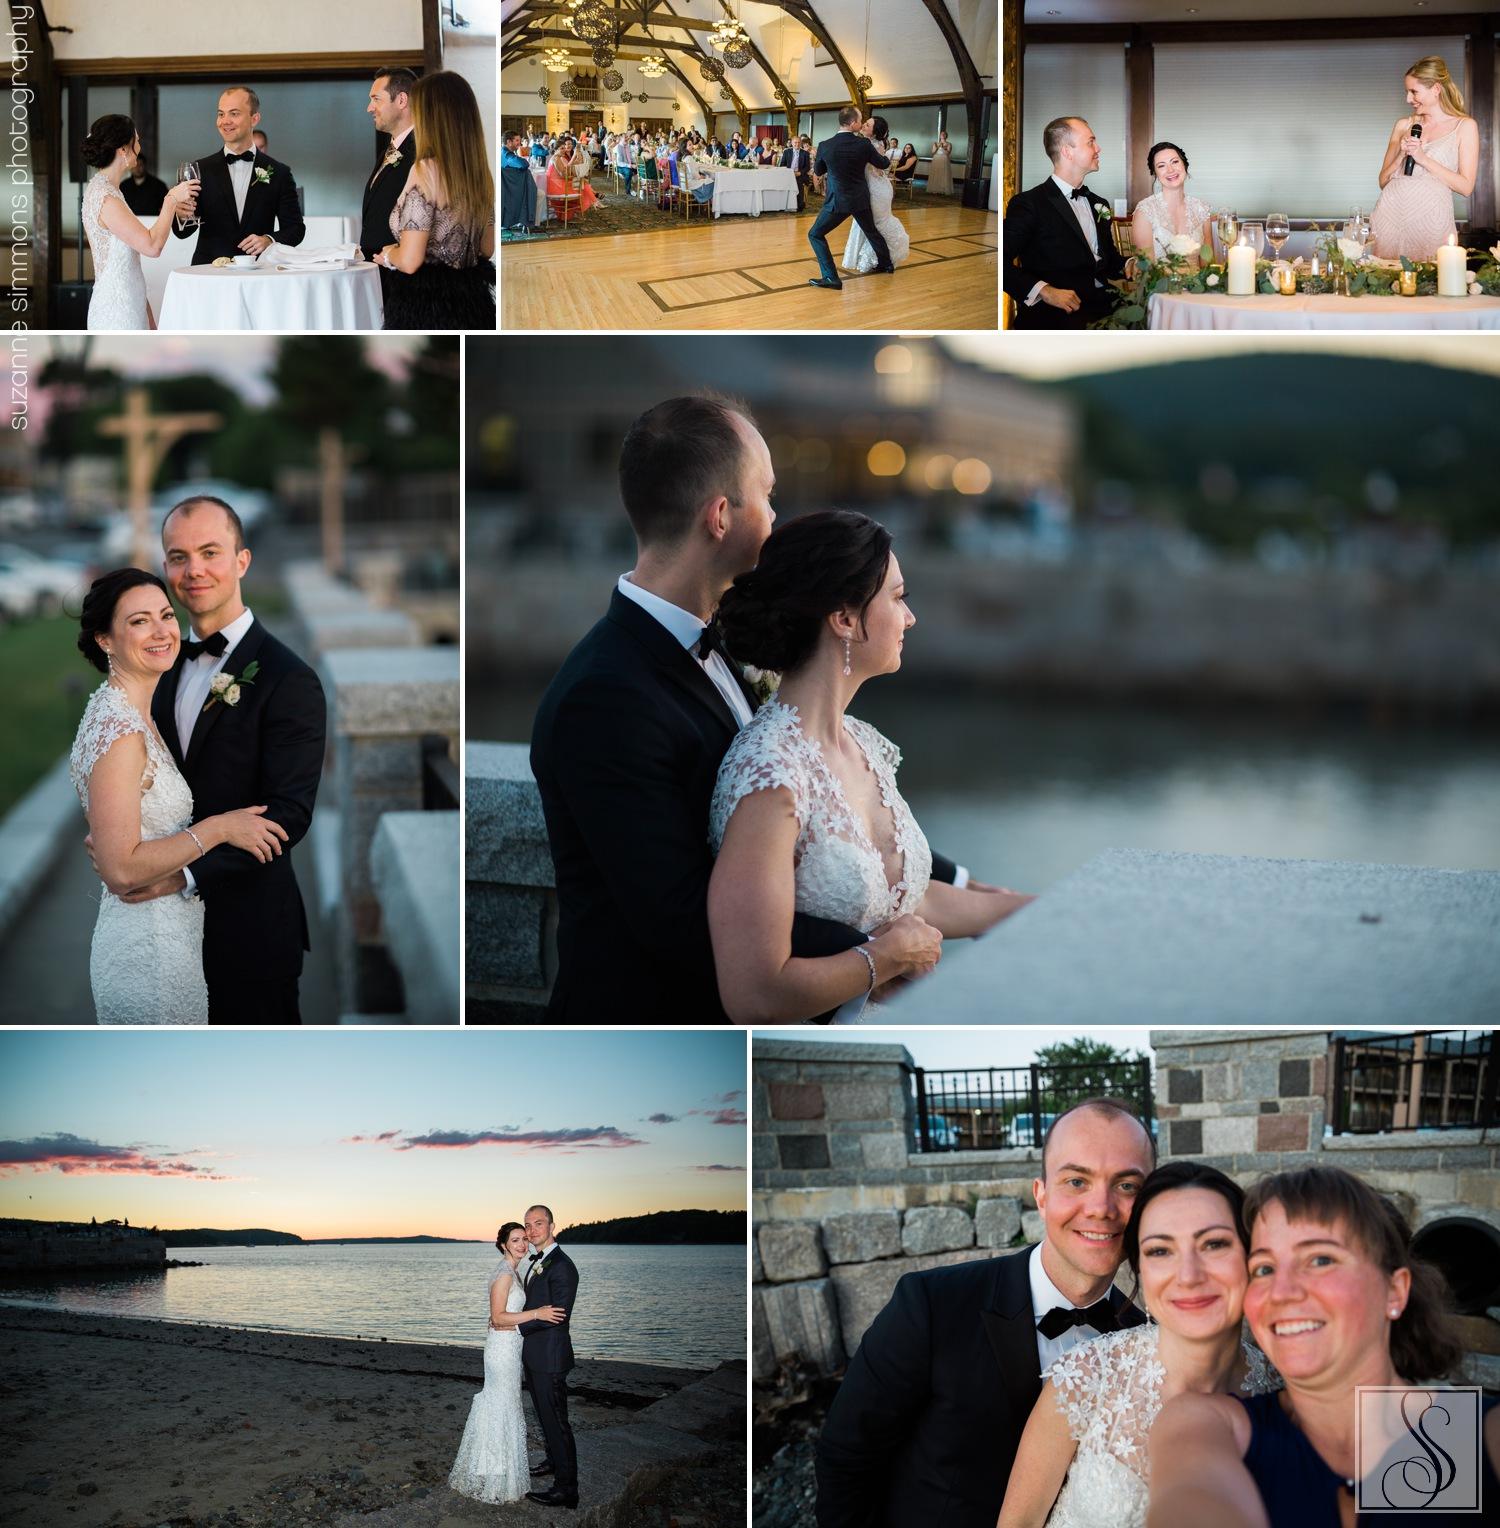 Sunset wedding portraits at the Bar Harbor Club